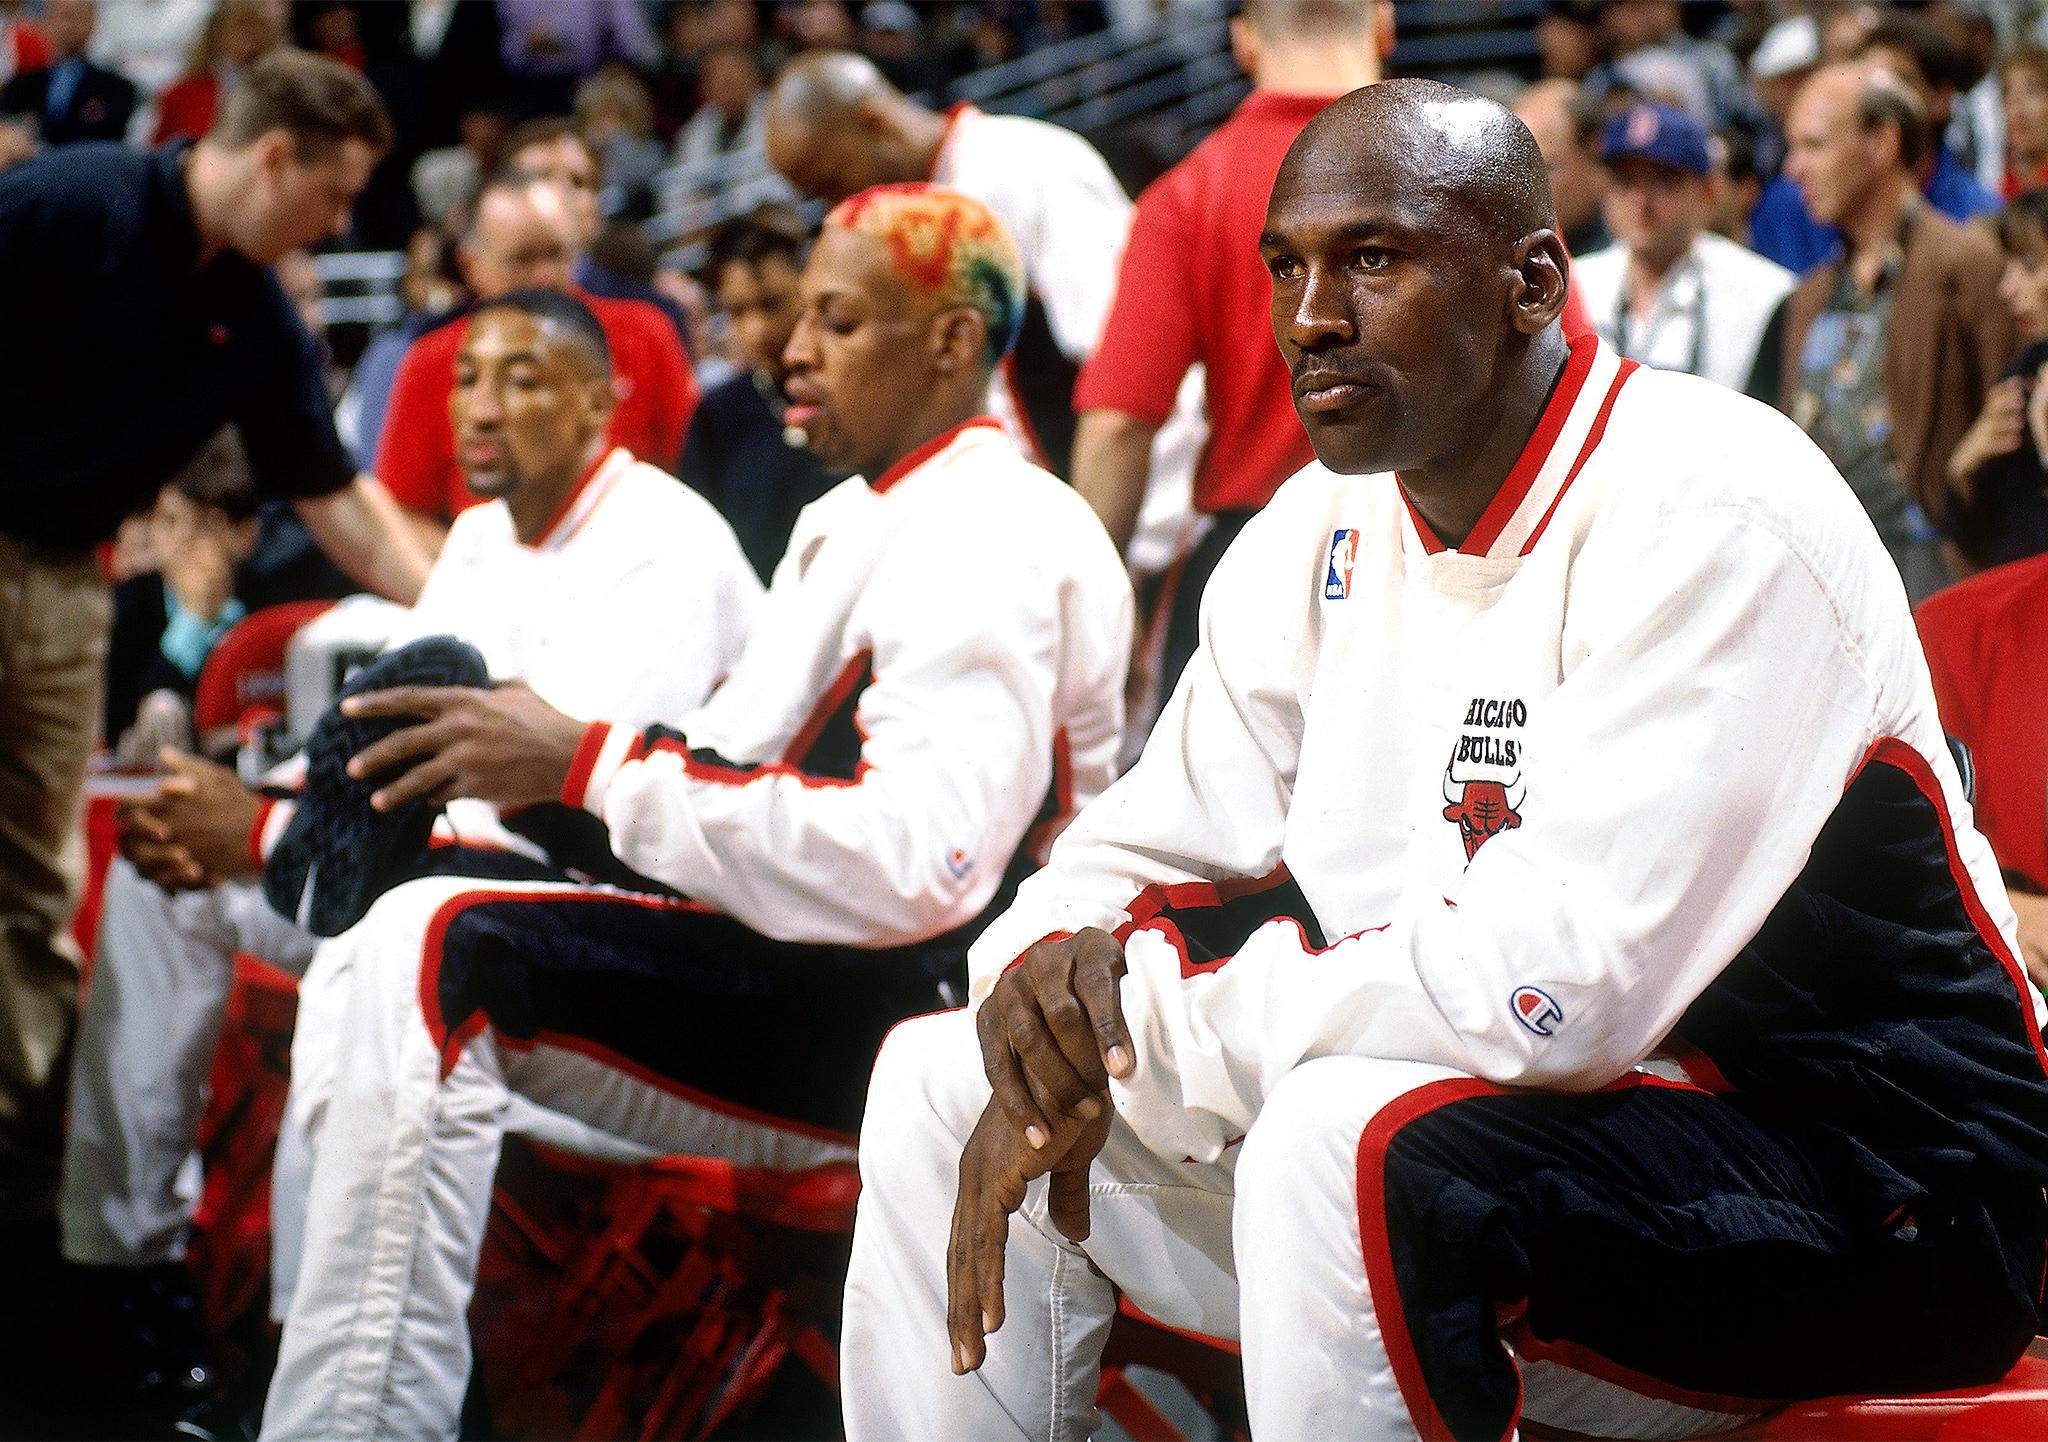 1. 1996 Chicago Bulls - Top 20 Greatest NBA Teams Ever - ESPN